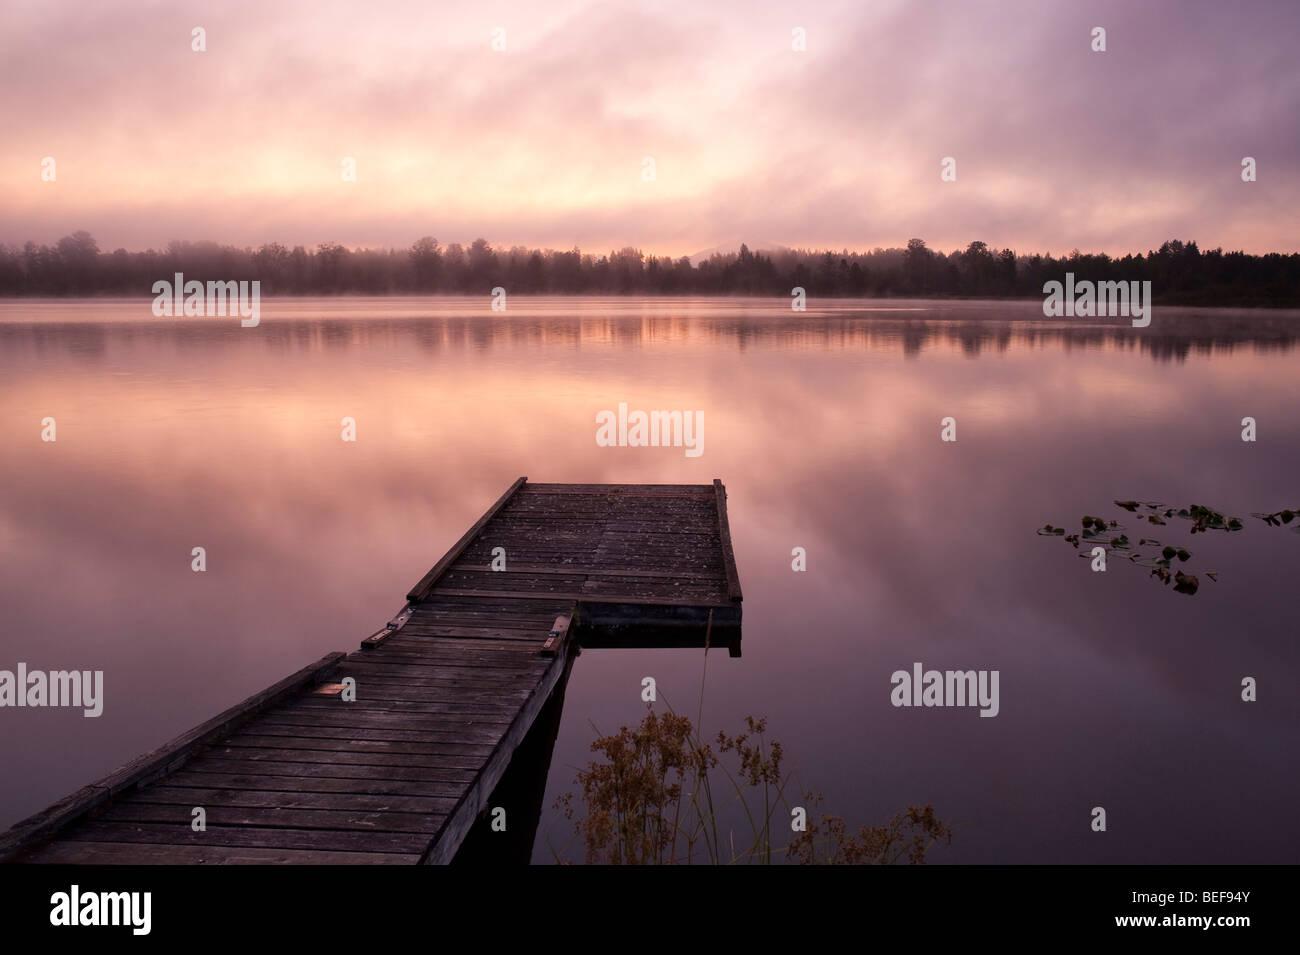 Cassidy See Sonnenaufgang im Nebel mit dock Stockbild